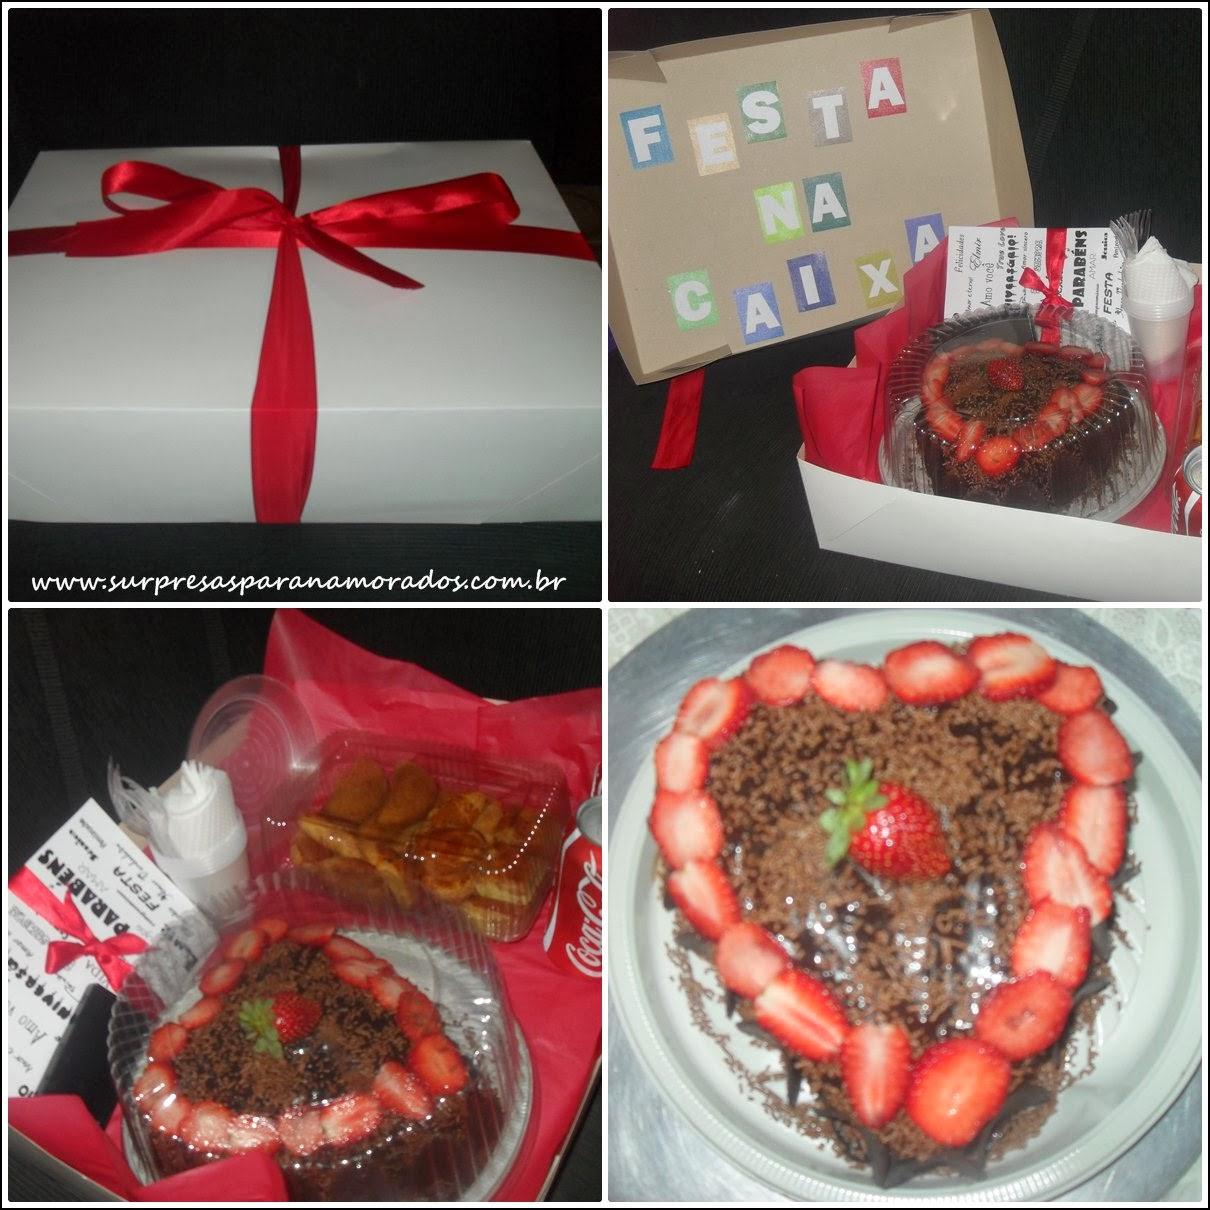 Festa na caixa para o namorado  Surpresas para Namorados